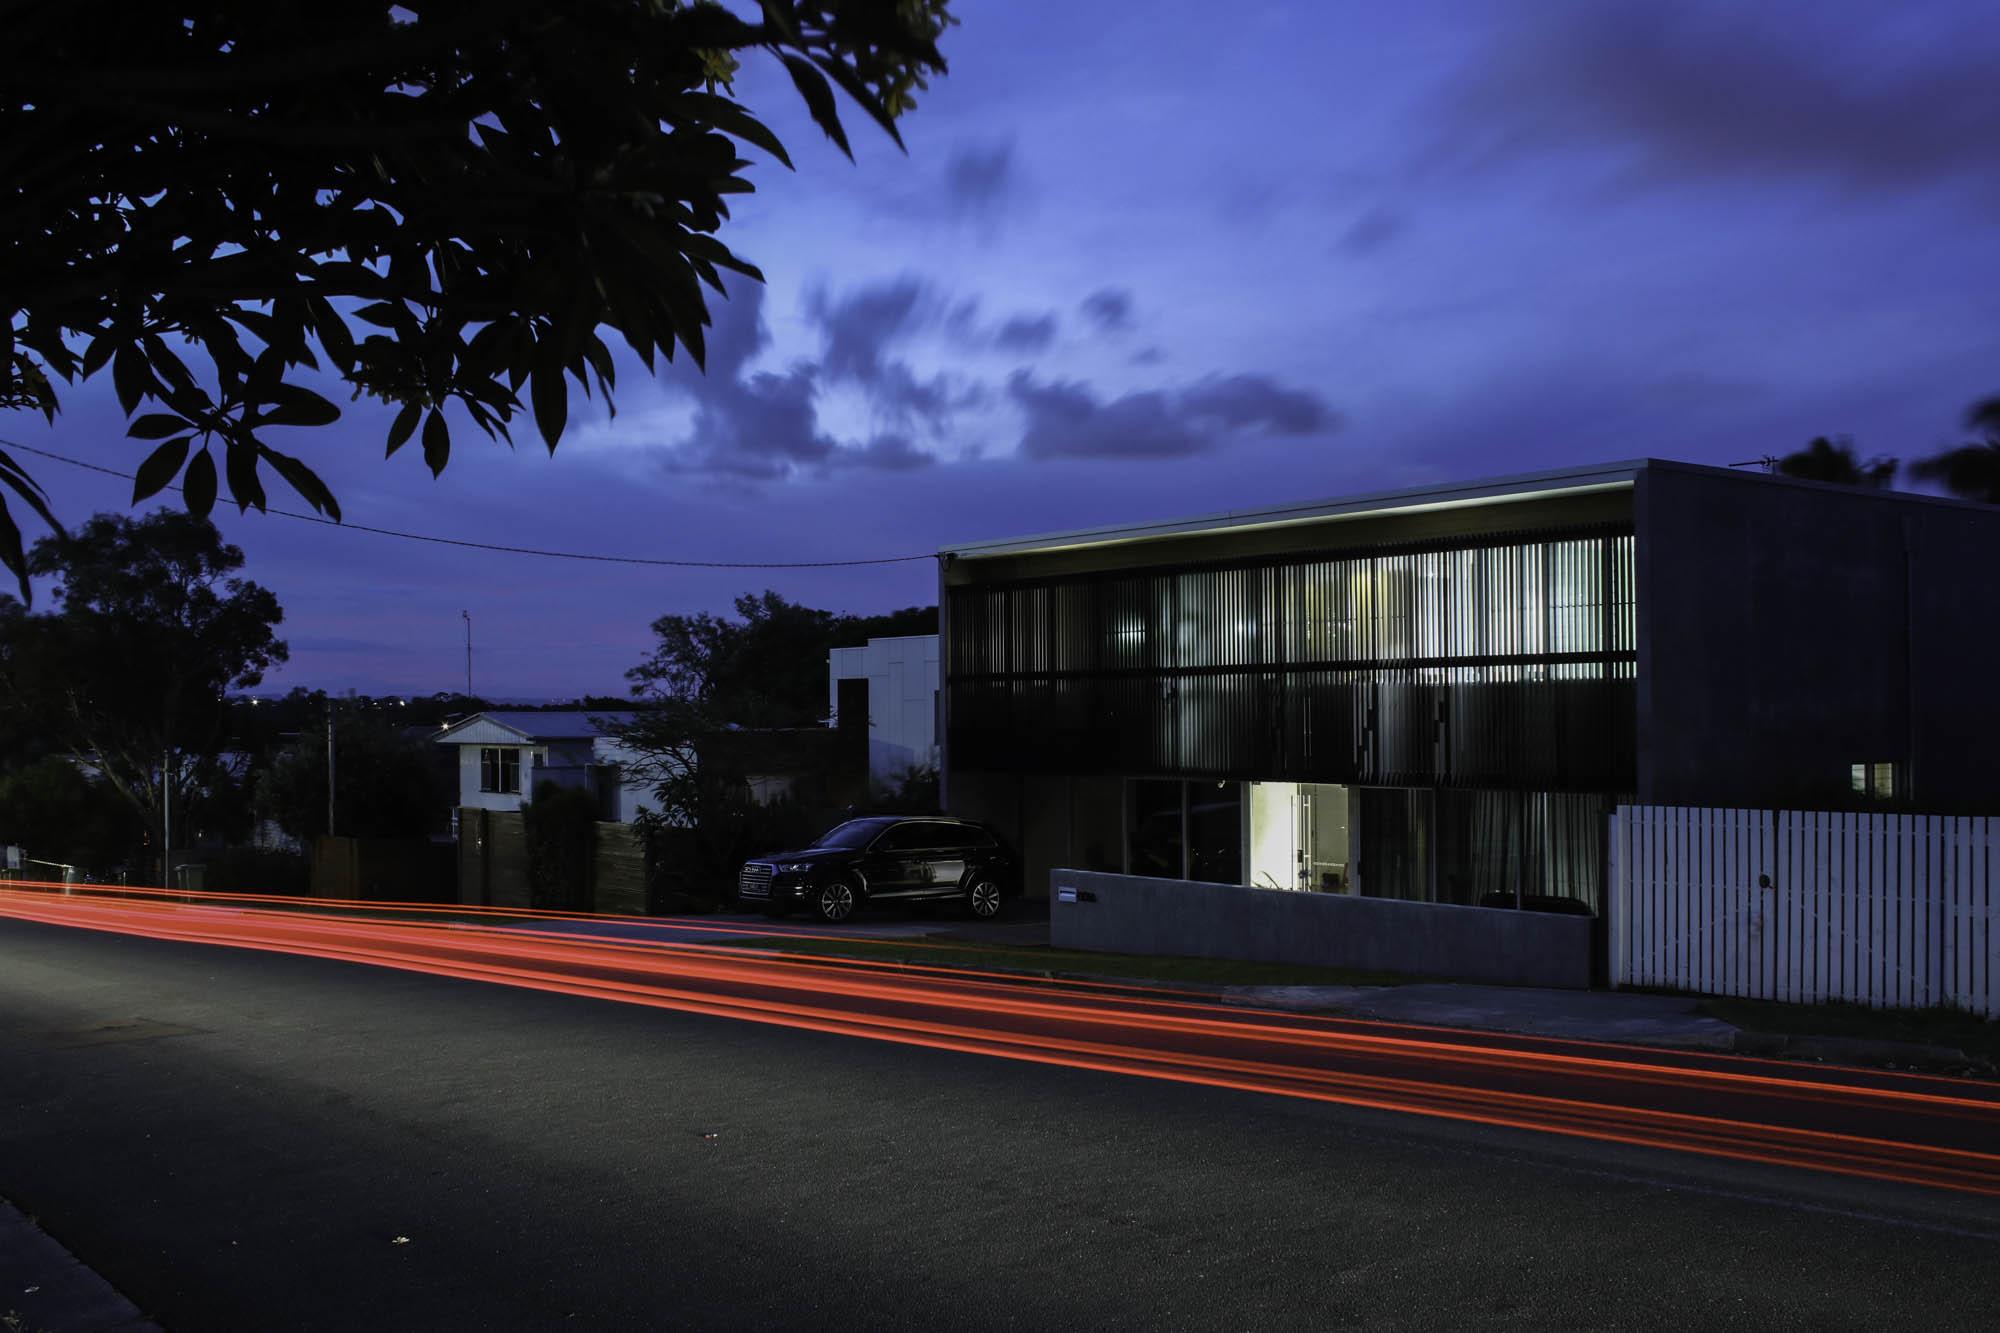 slater night street-scape